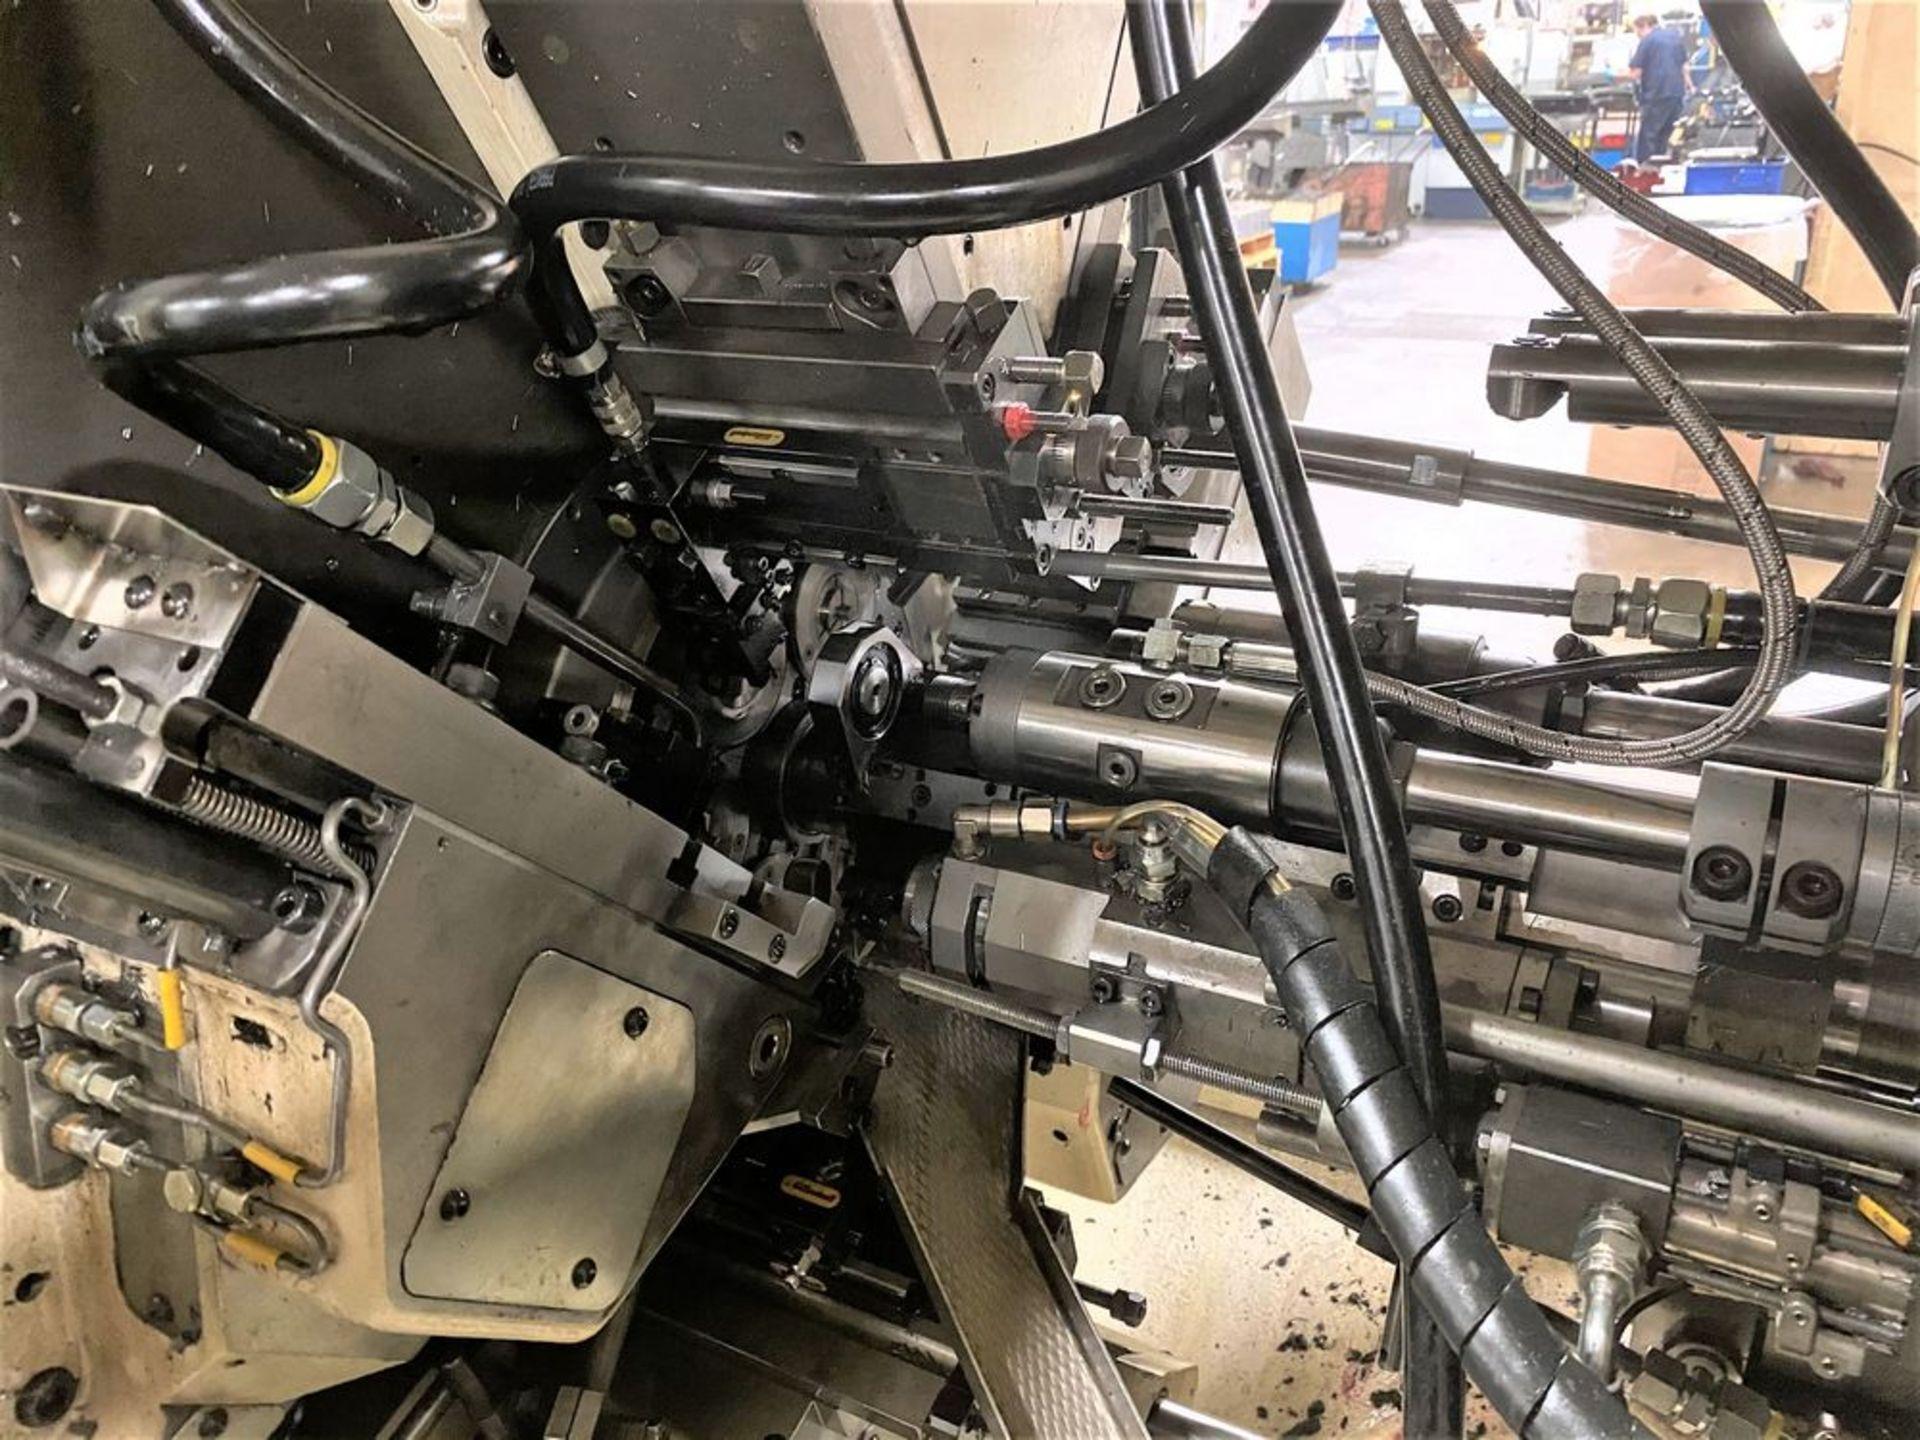 Lot 8B - ZPS Mori-Say 620SUAC 6 Spindle Super Precision Automatic Bar (Screw) Machine, New 2016